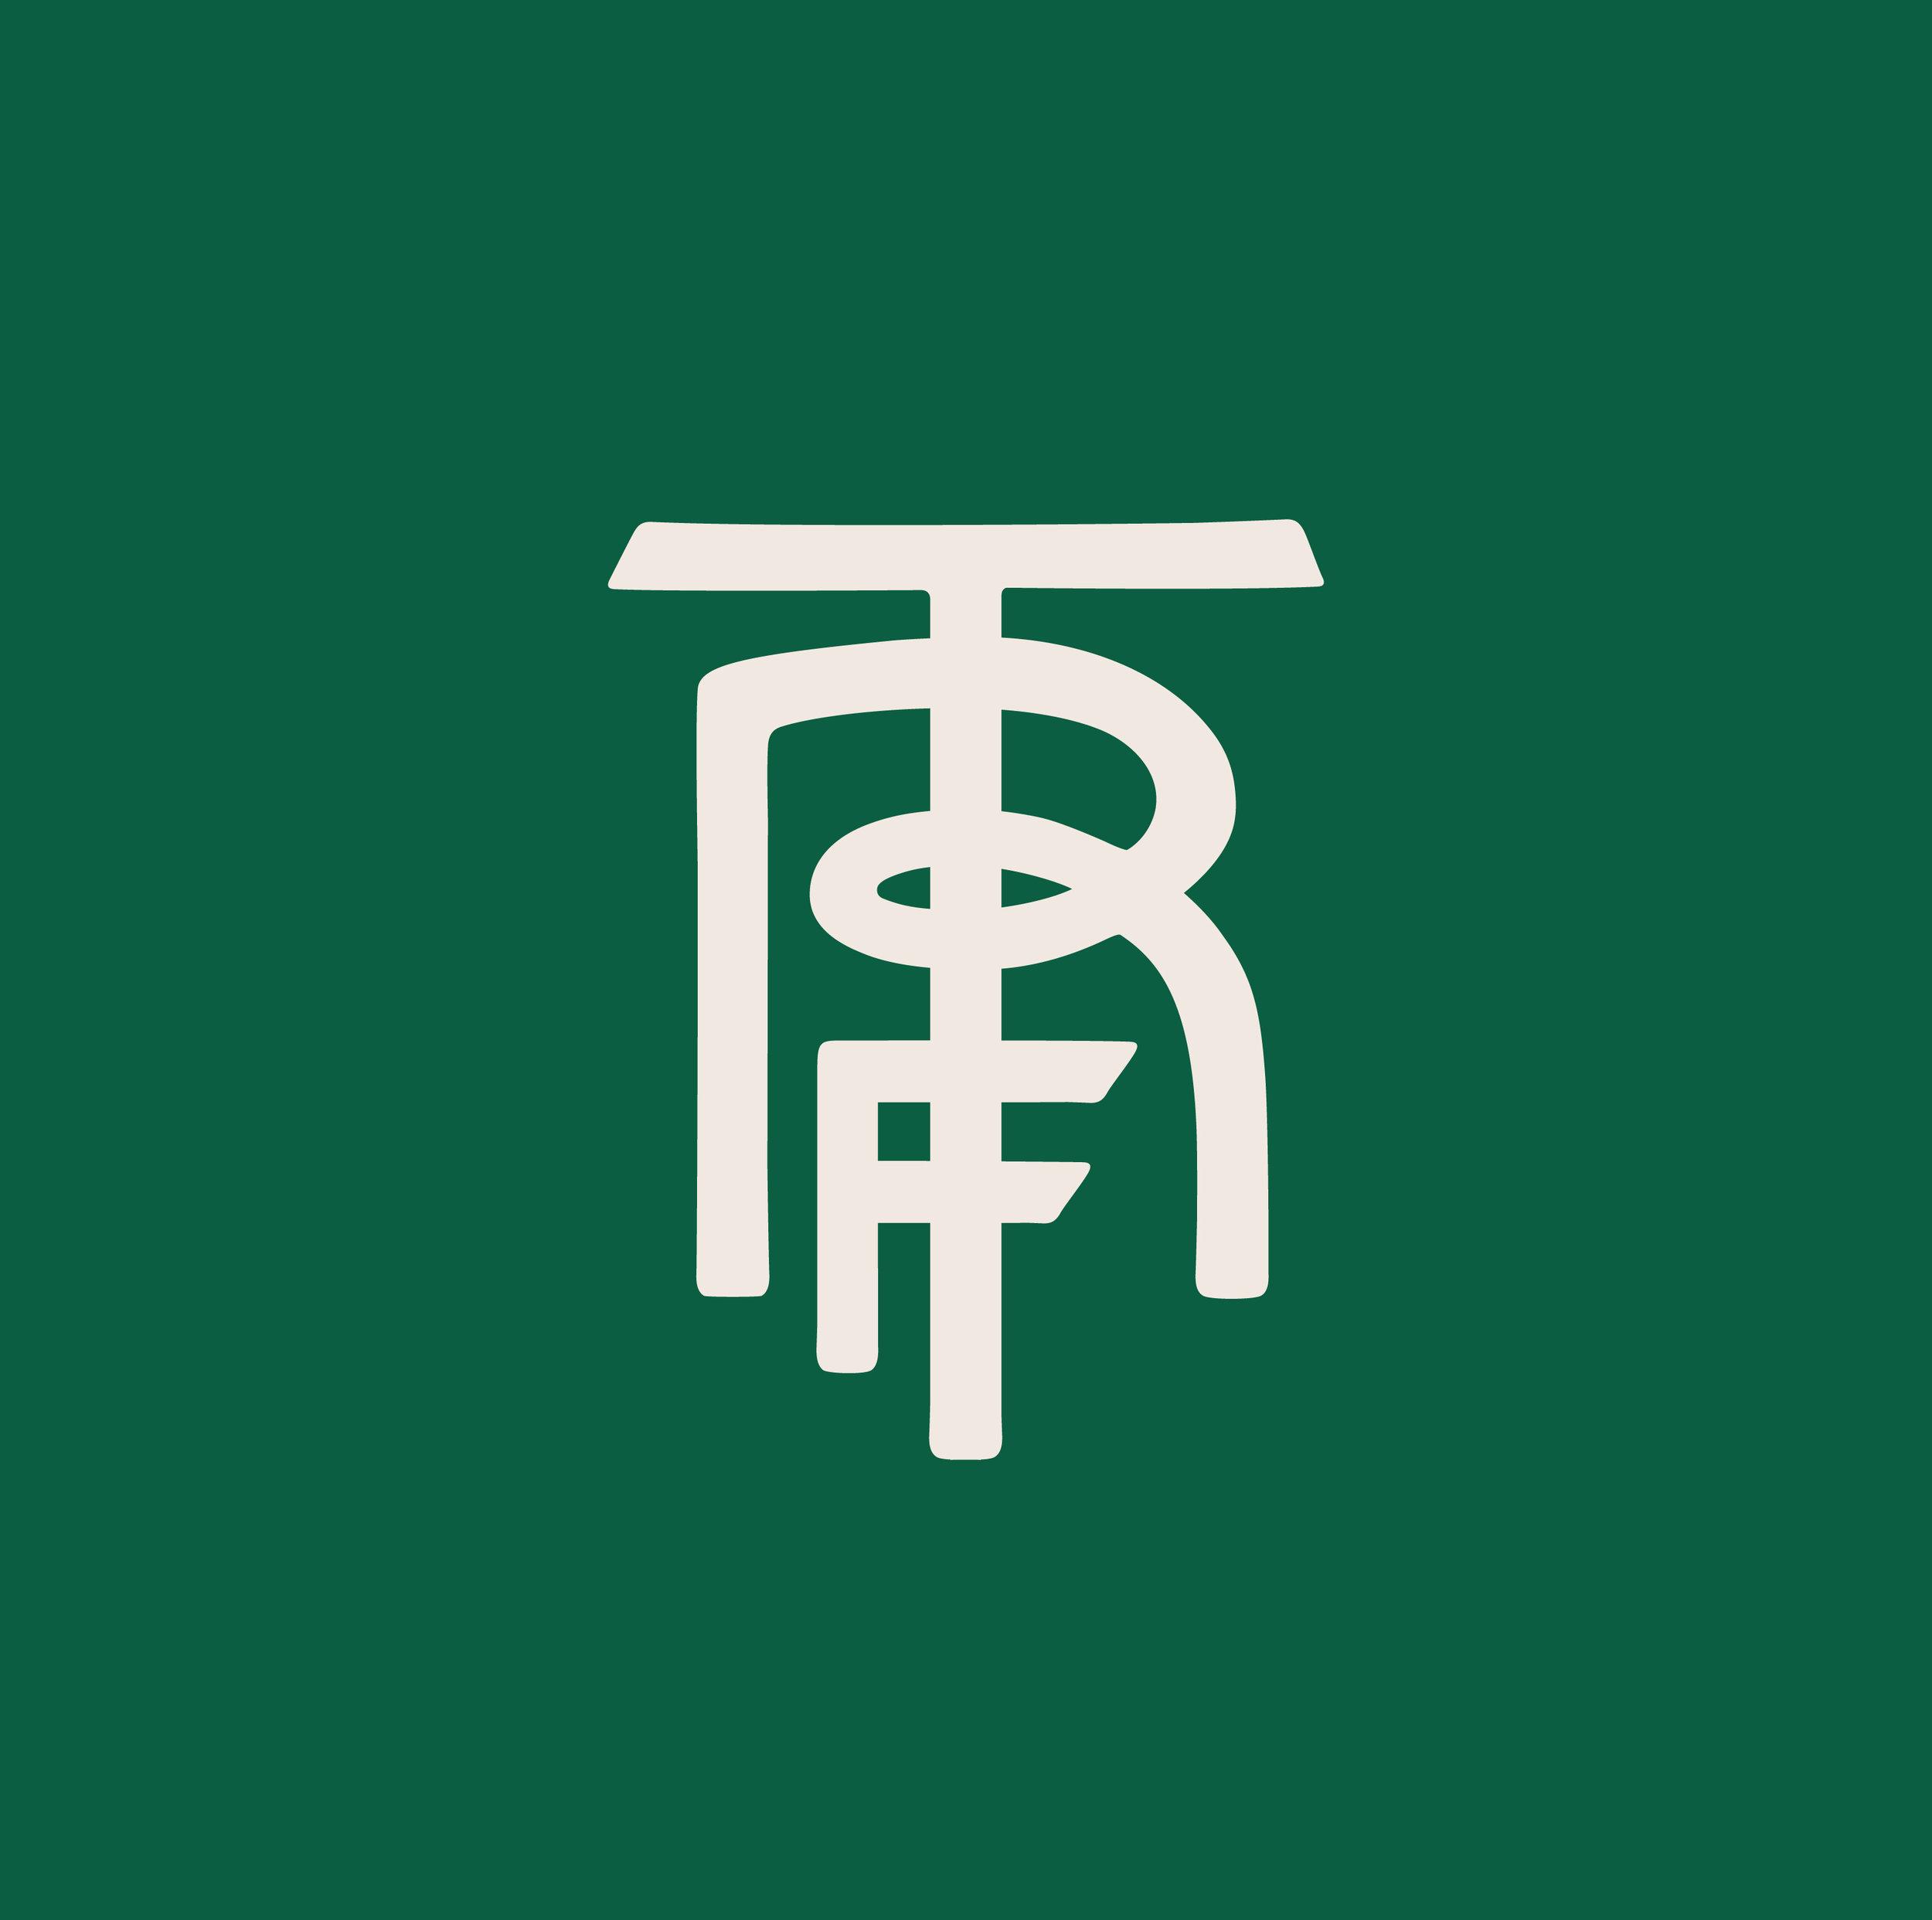 TRFco_Final_Logo_MonoOnGreen.jpg